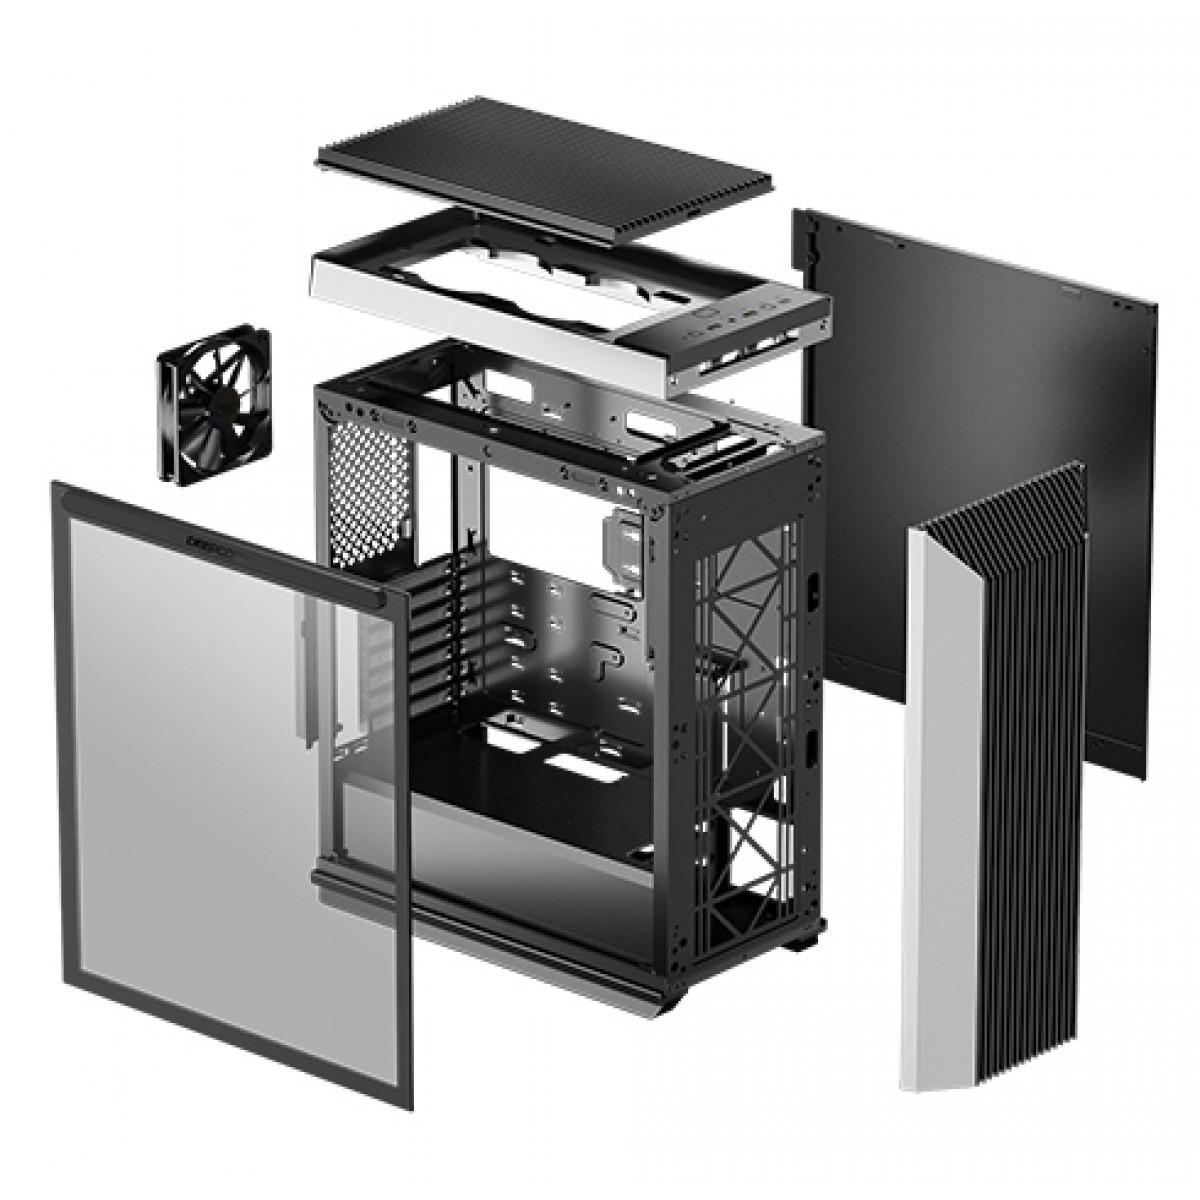 Gabinete Gamer DeepCool, CL500, Mid Tower, Vidro Temperado, Black, R-CL500-BKNMA0N-C-1, Sem Fonte, Com 1 Fan